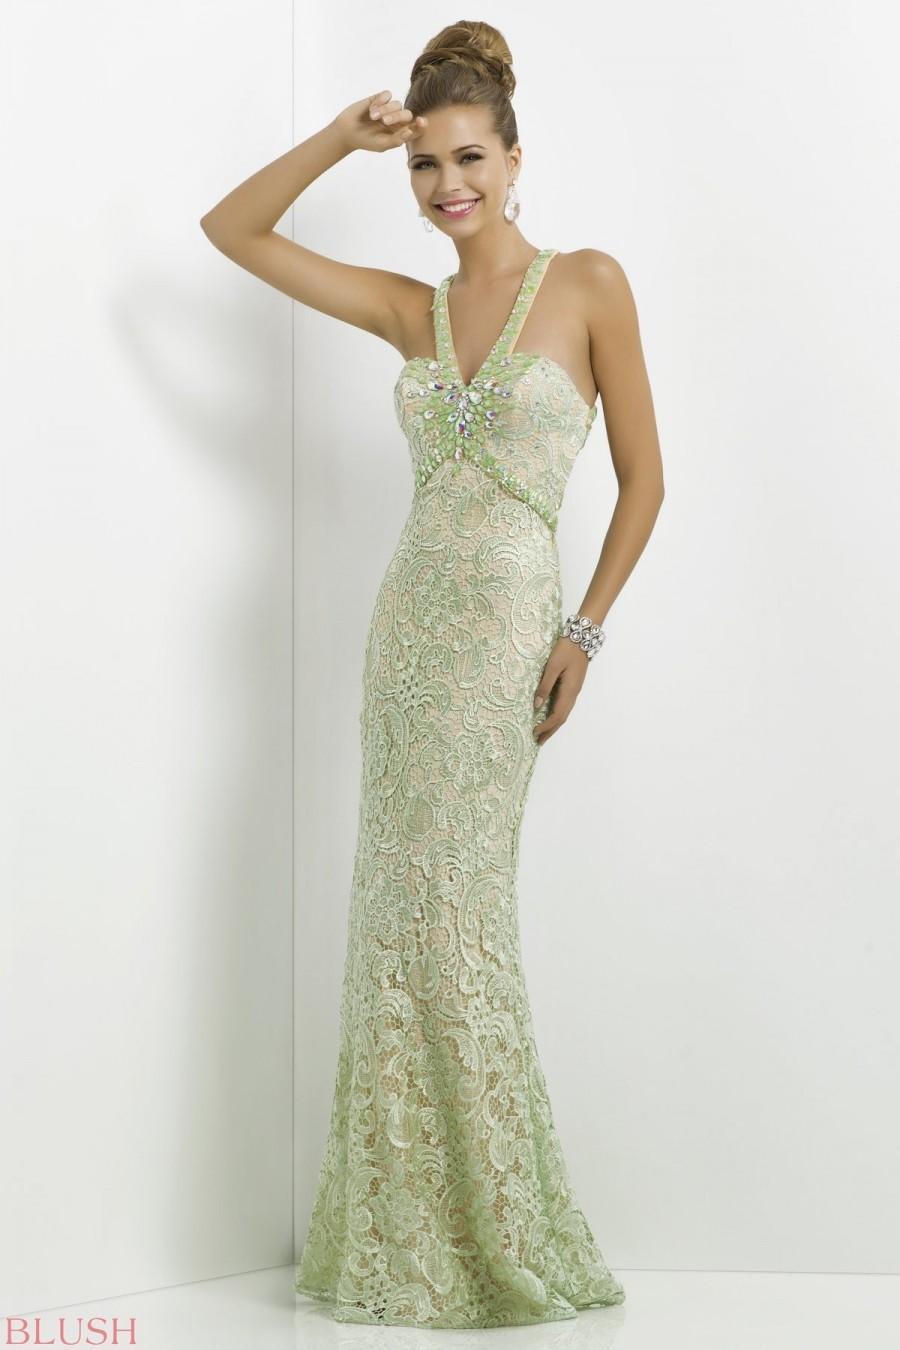 Blush Prom Dress Style 9753 2016 Spring Trends Dresses 2570250